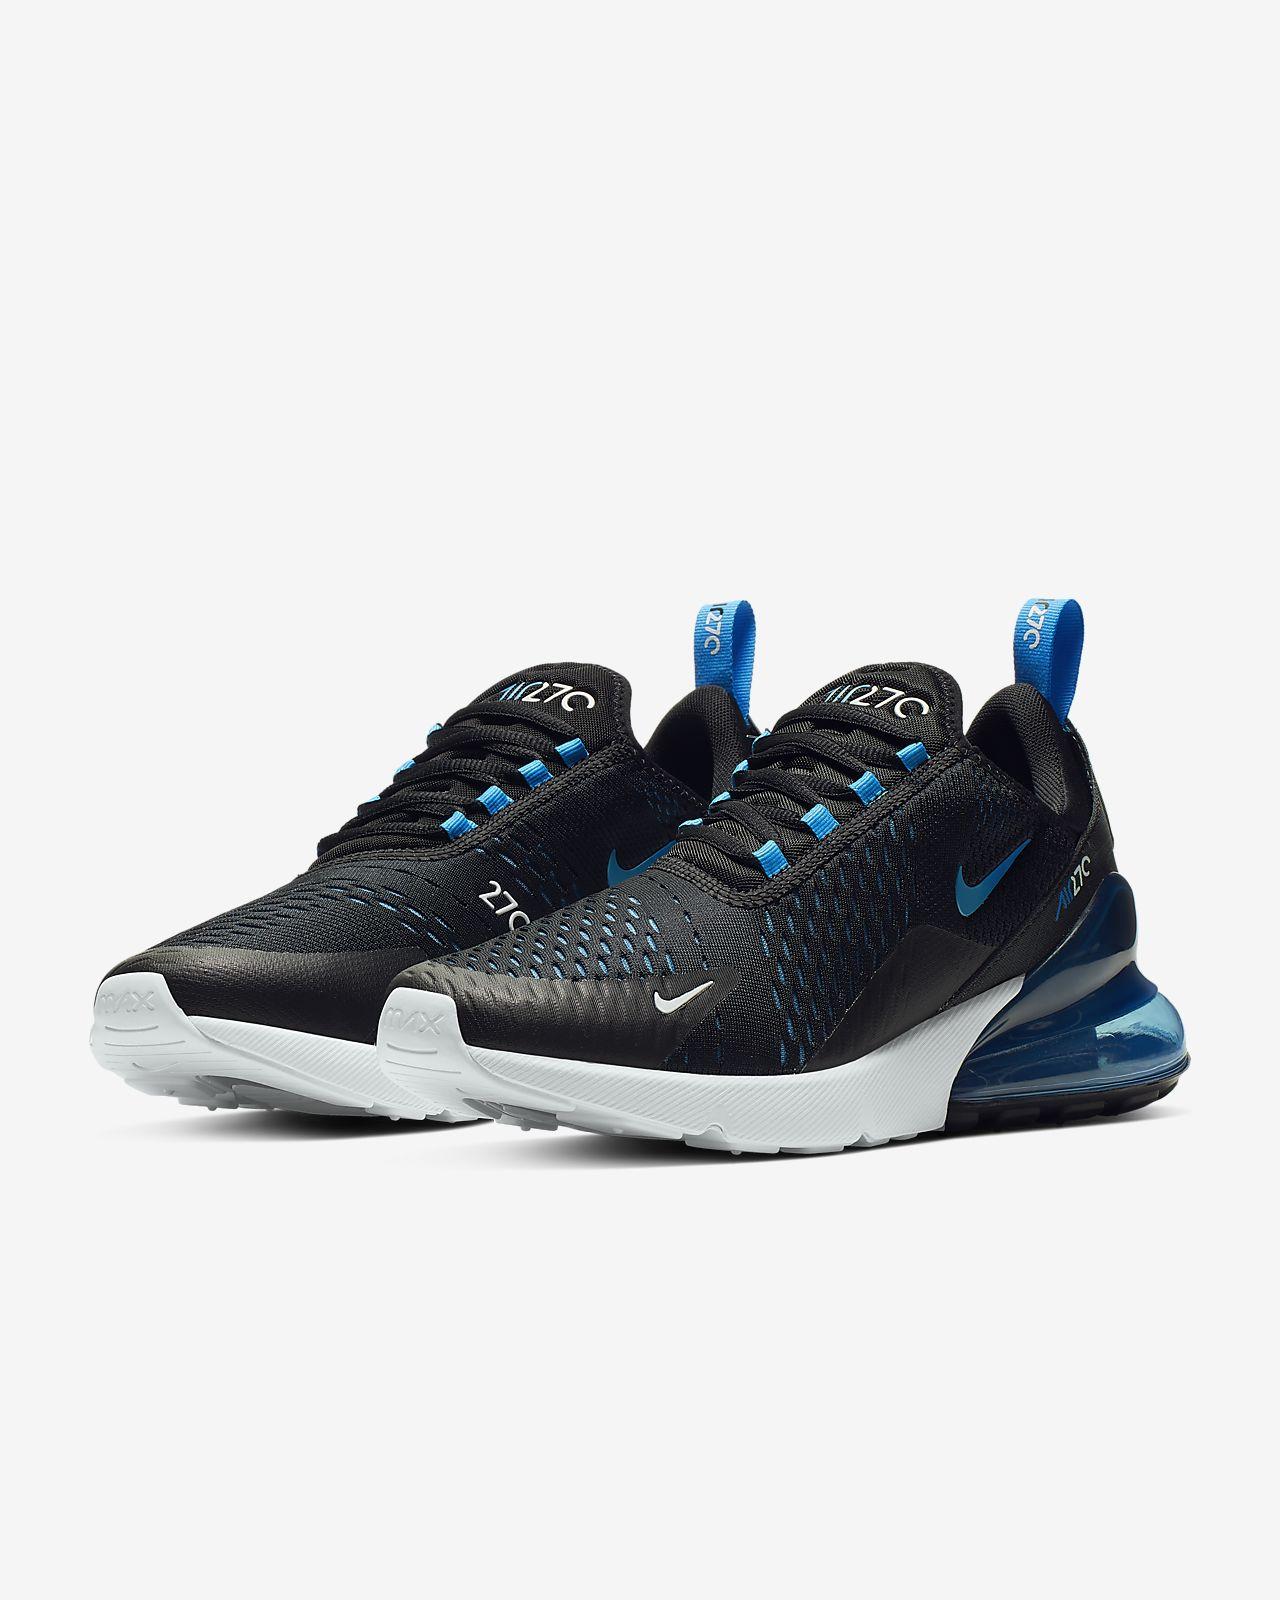 separation shoes 94d92 b7fd9 ... Scarpa Nike Air Max 270 - Uomo